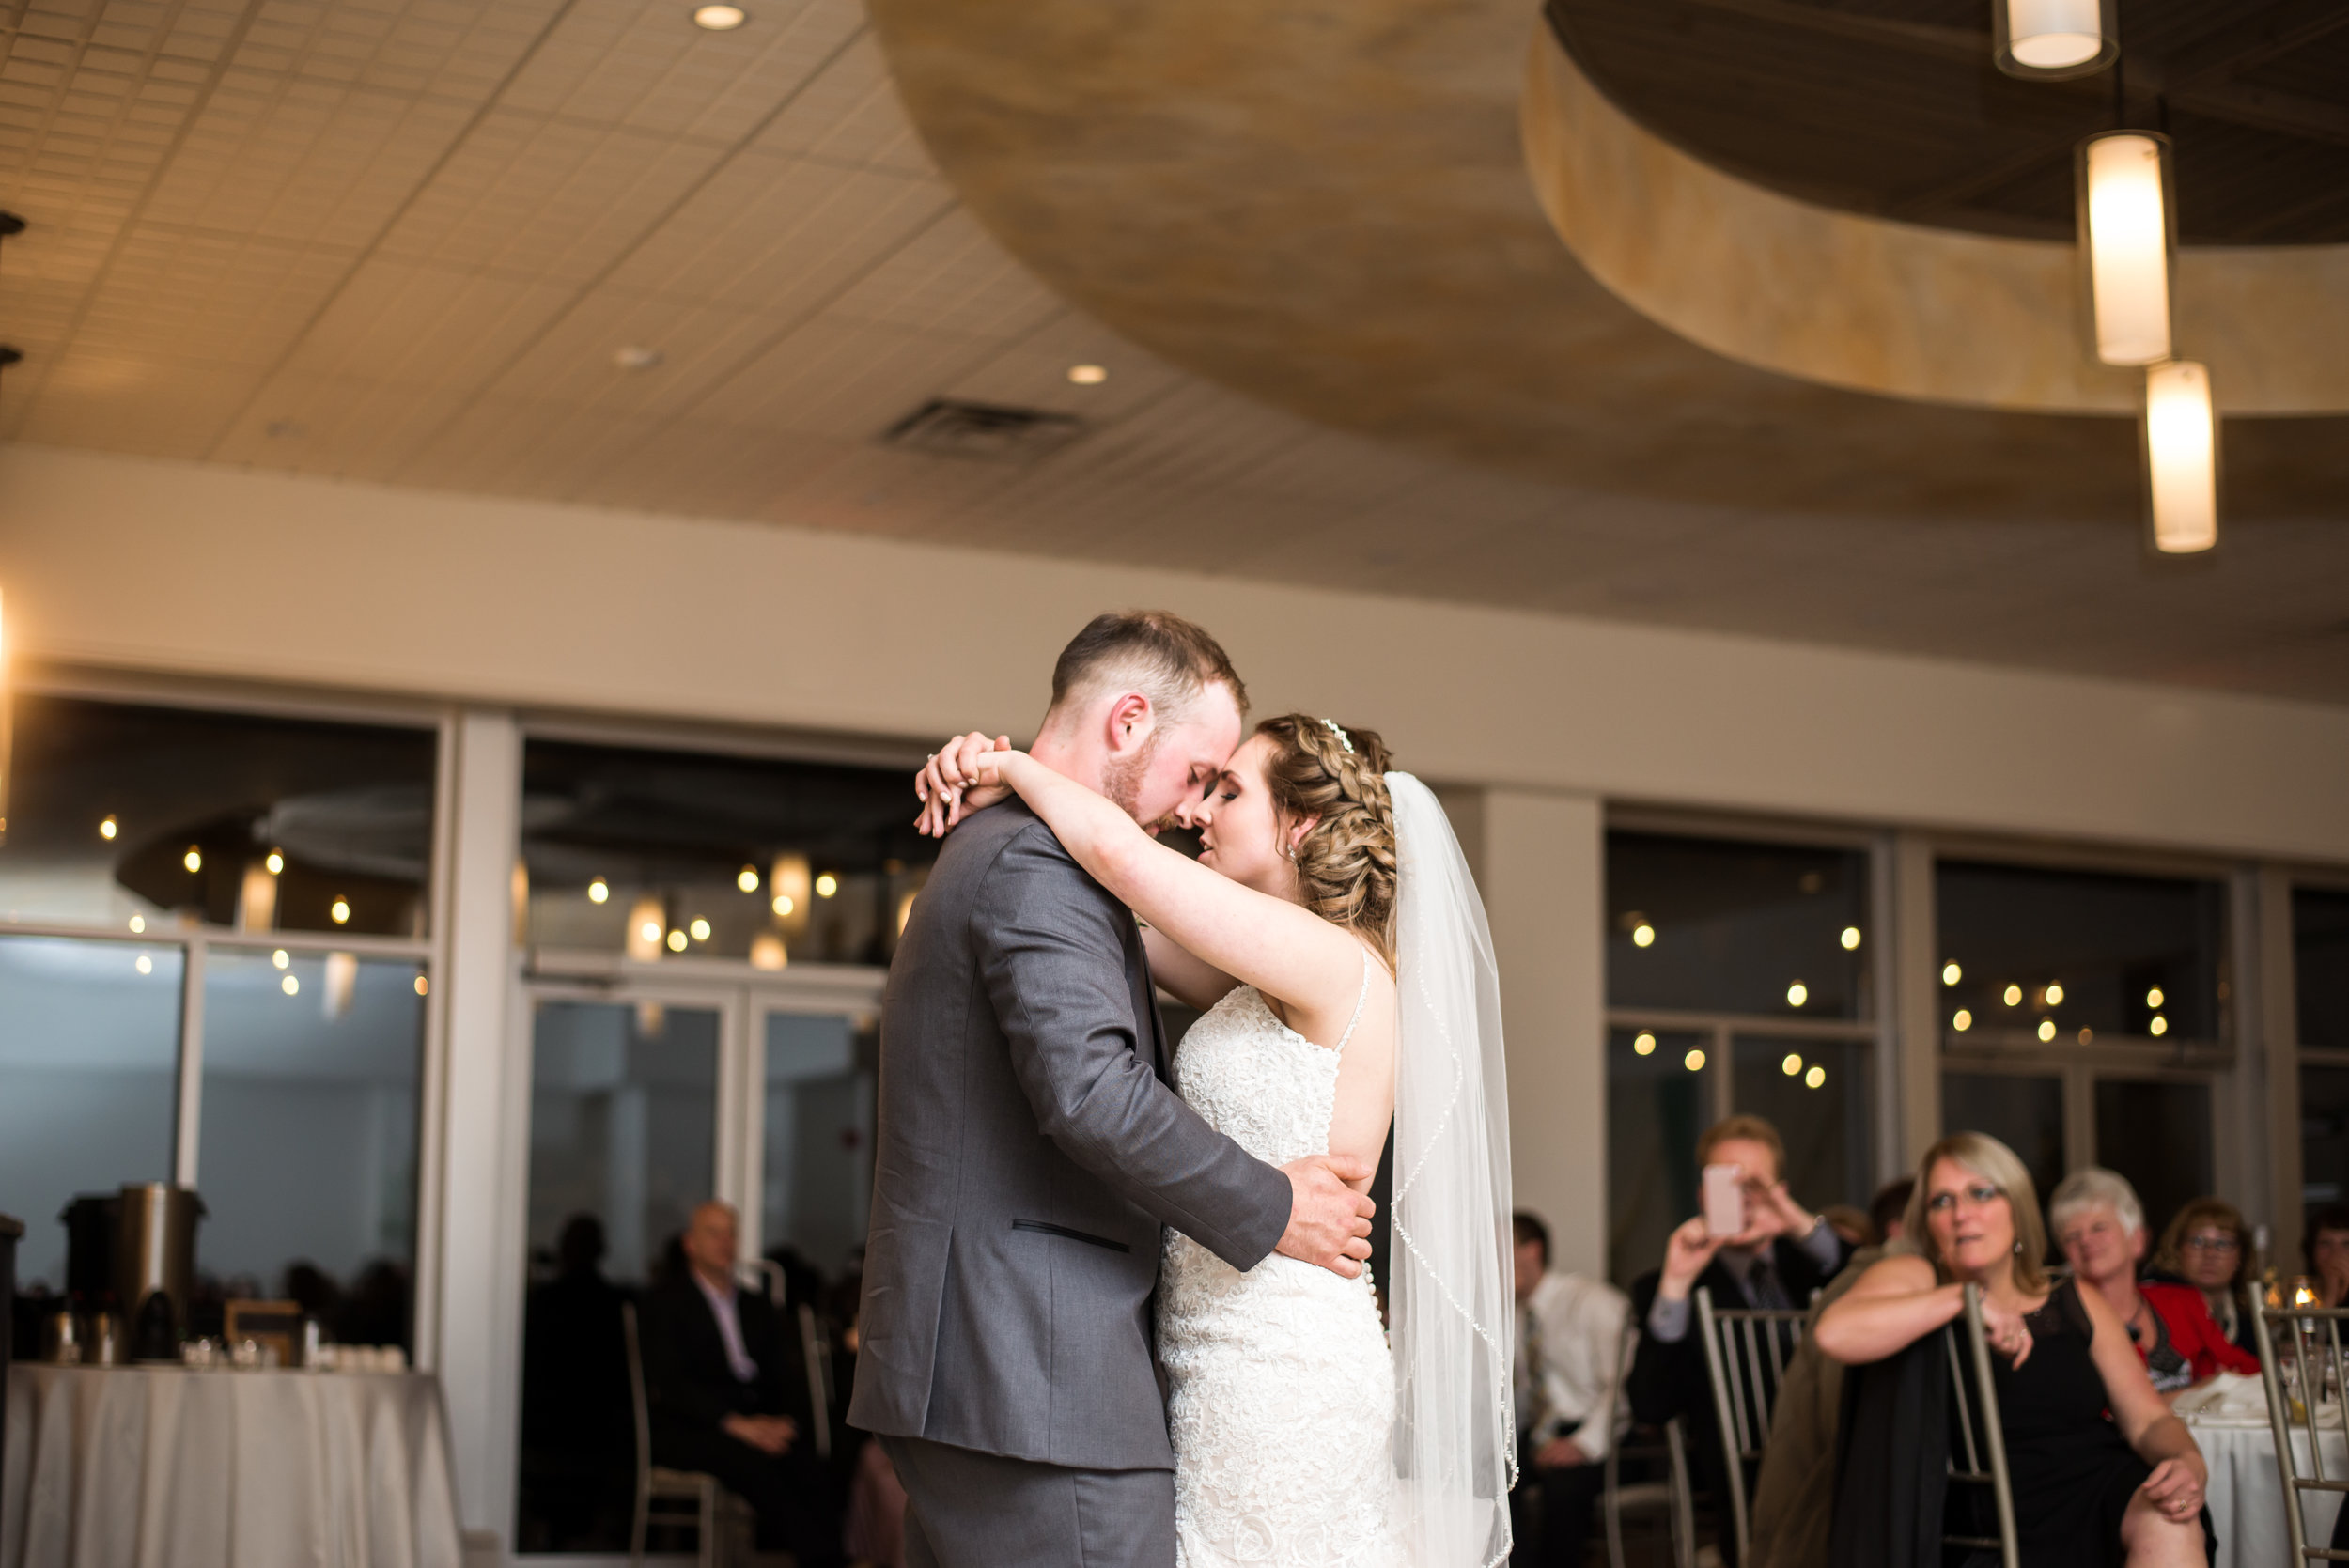 newlywed_first_dance_ballroom.jpg